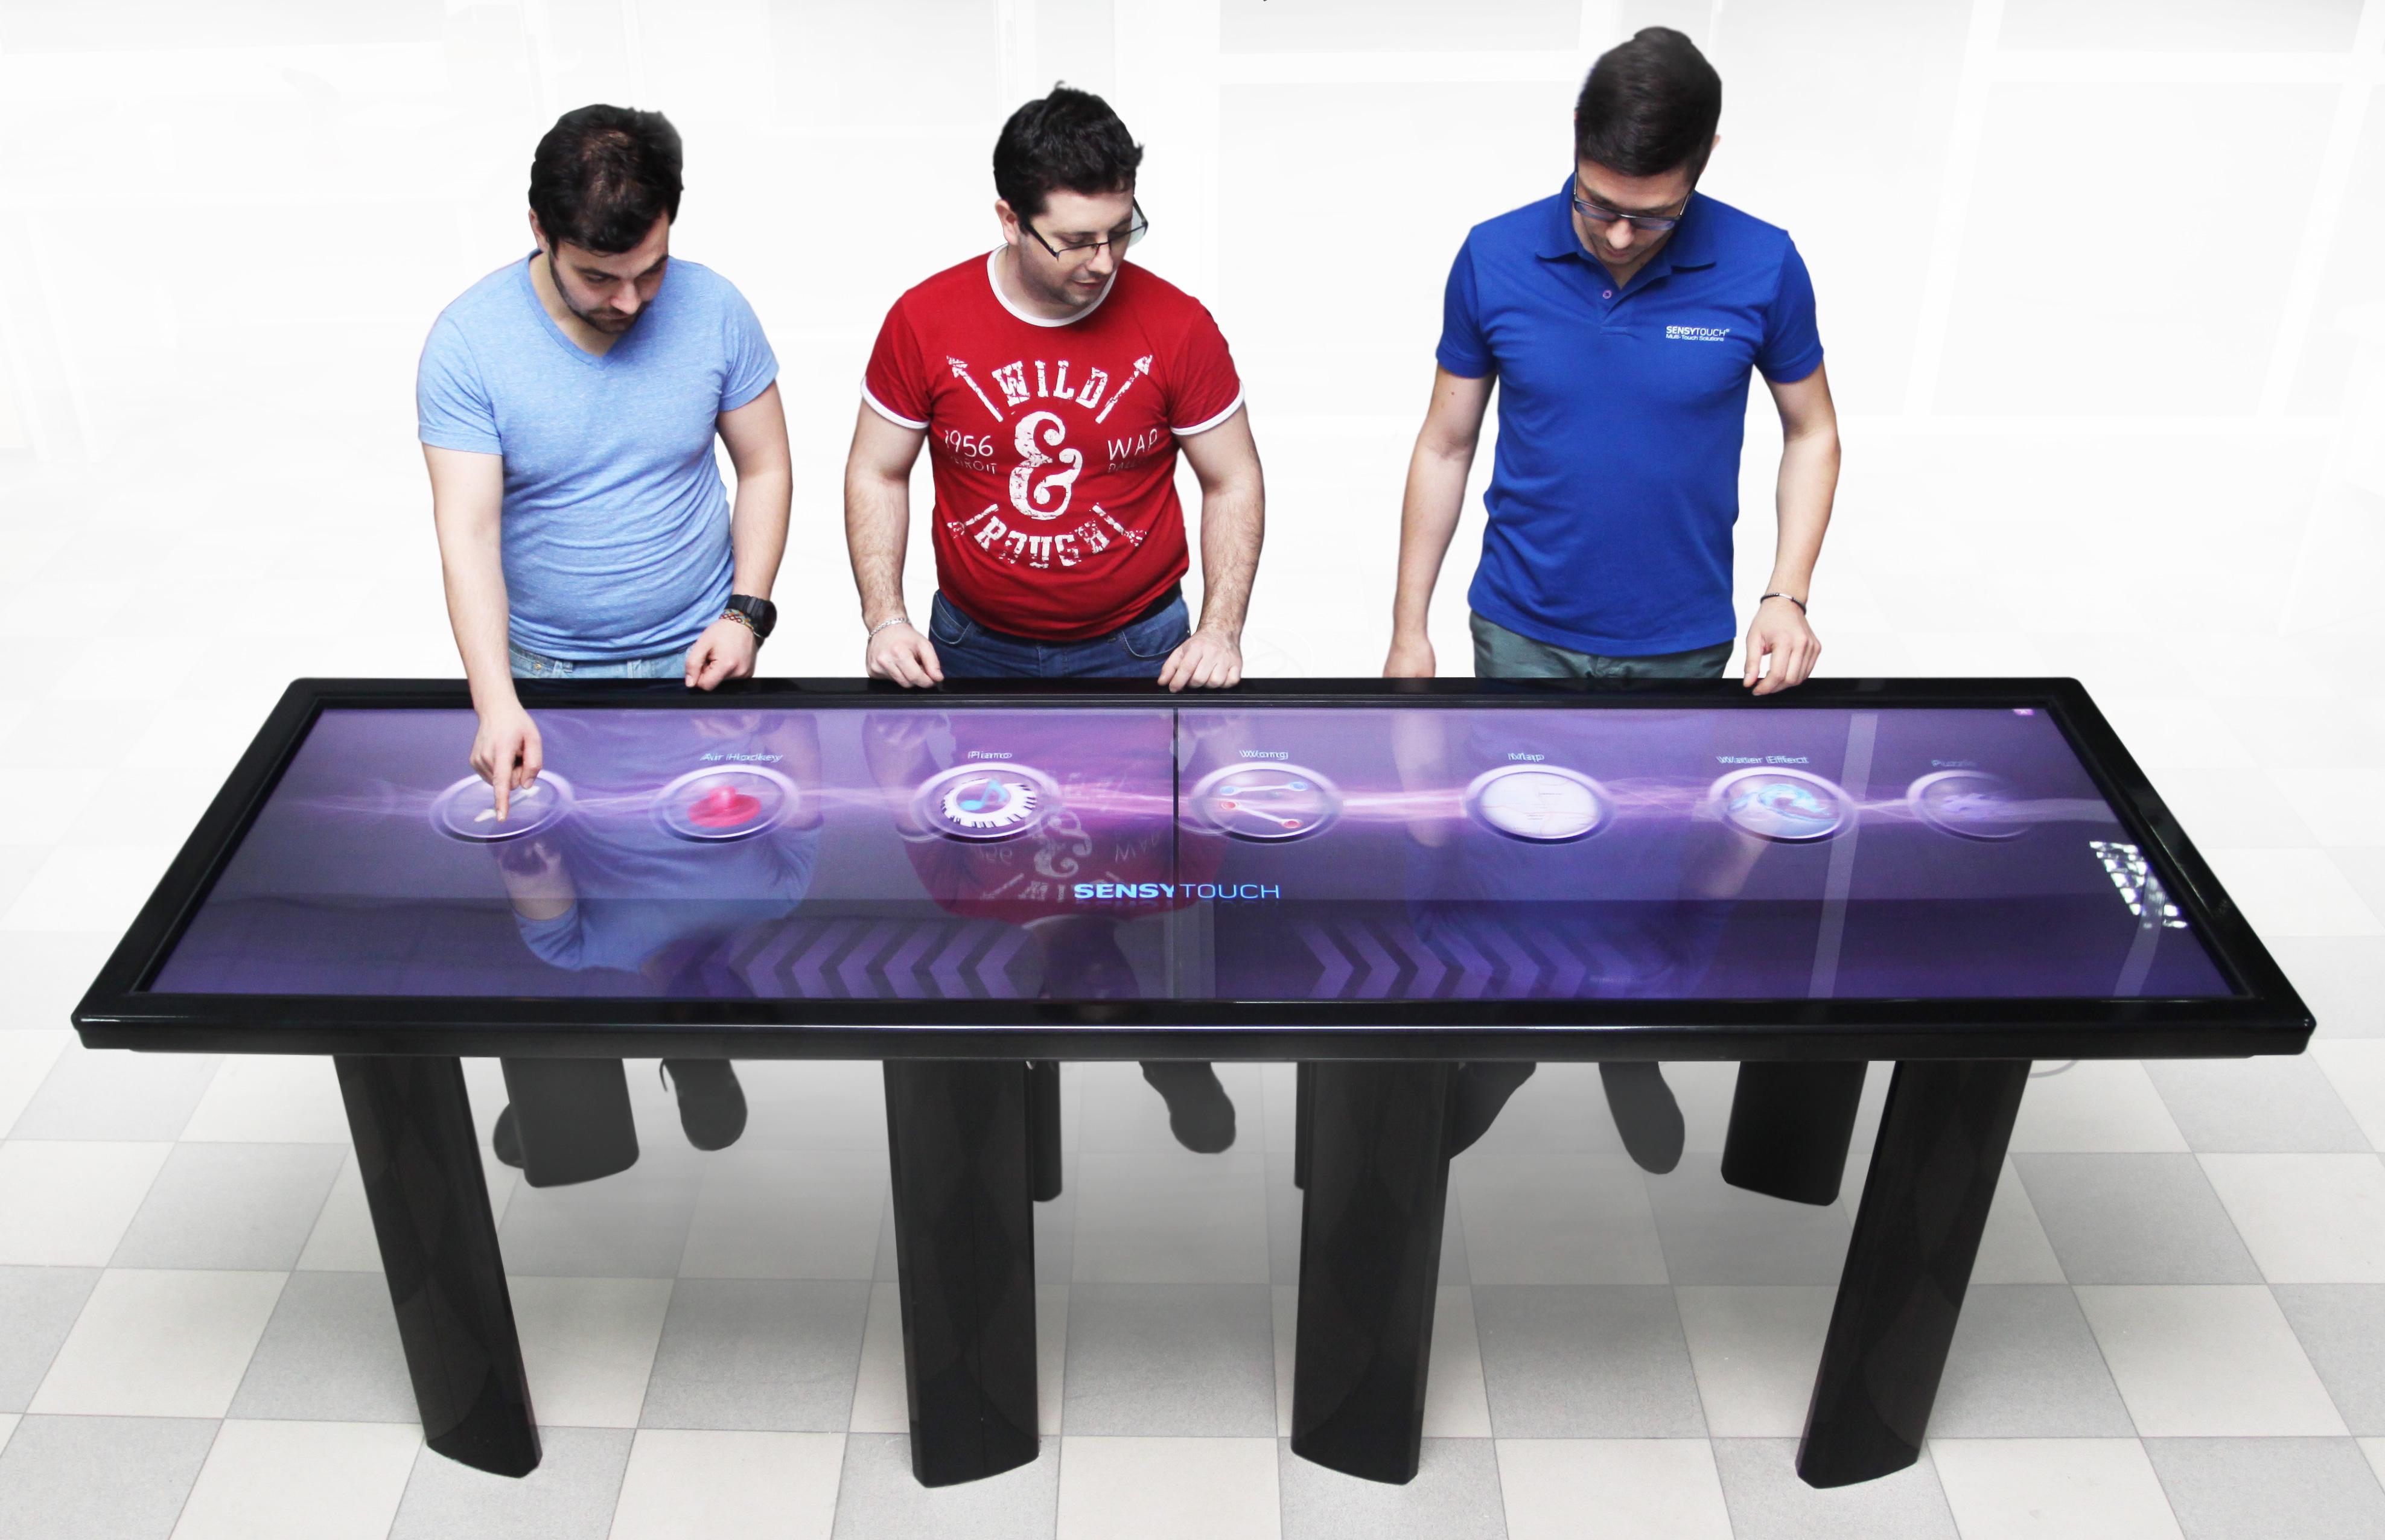 Sensytouch creates world s sleekest 100 inch multi touch table for Tisch interaction design